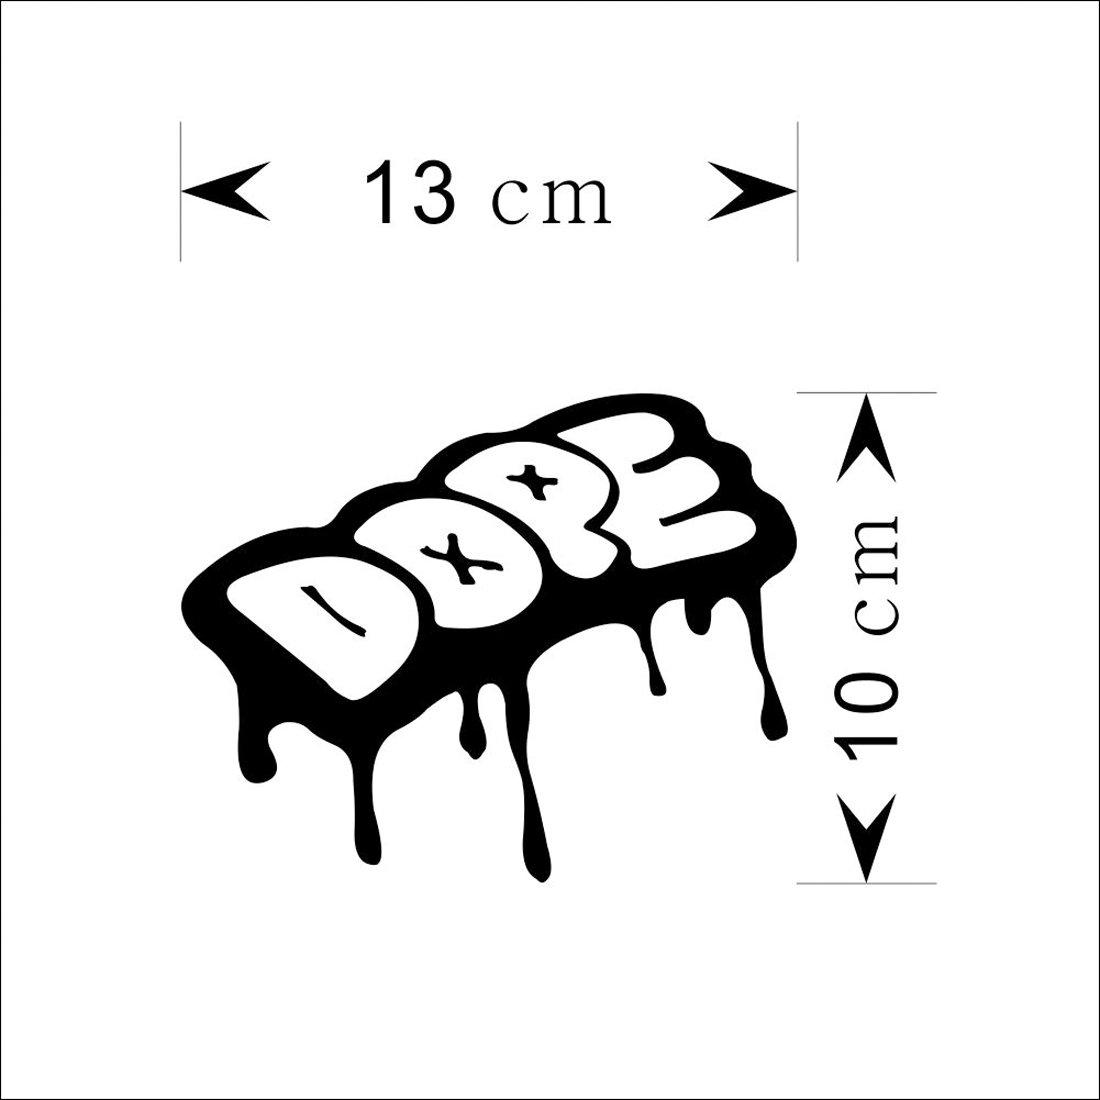 Oks removable car decor dope lettering graffiti wall stickers vinyl art mural amazon co uk kitchen home